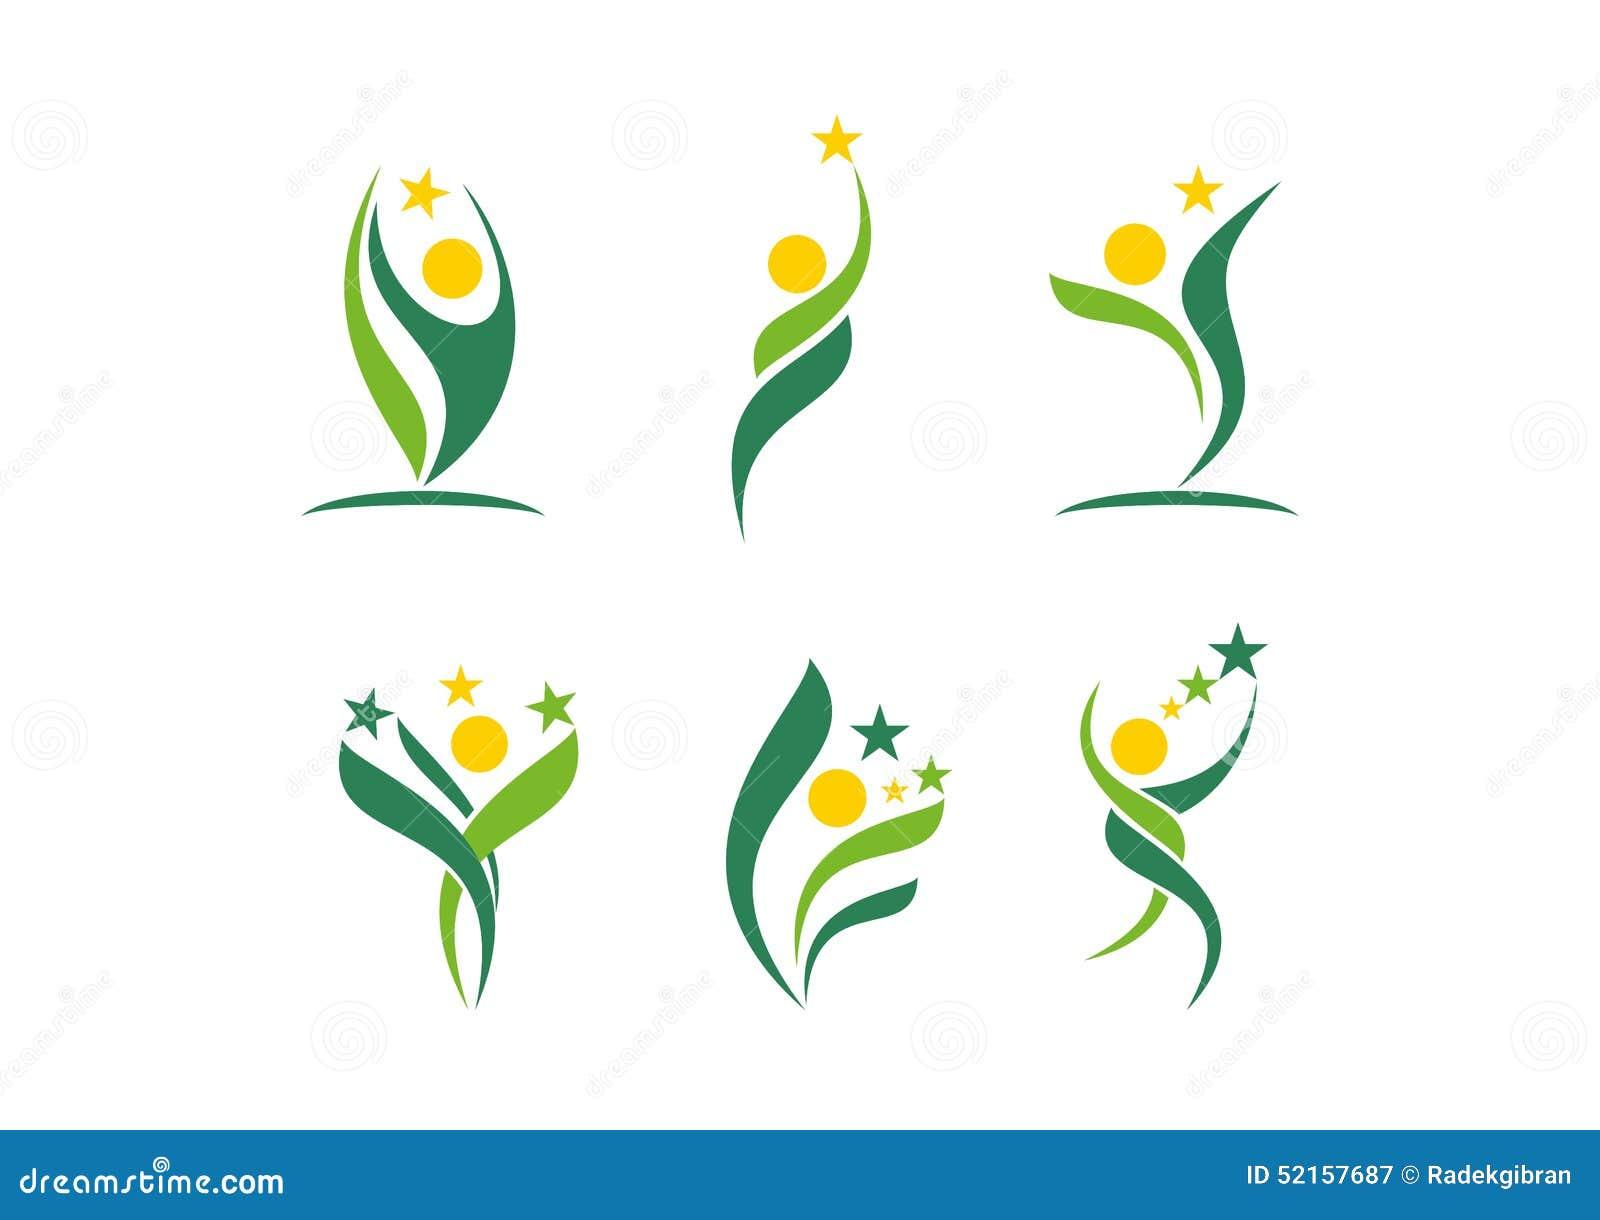 People  Wellness  Celebration  Logo  Health  Ecology